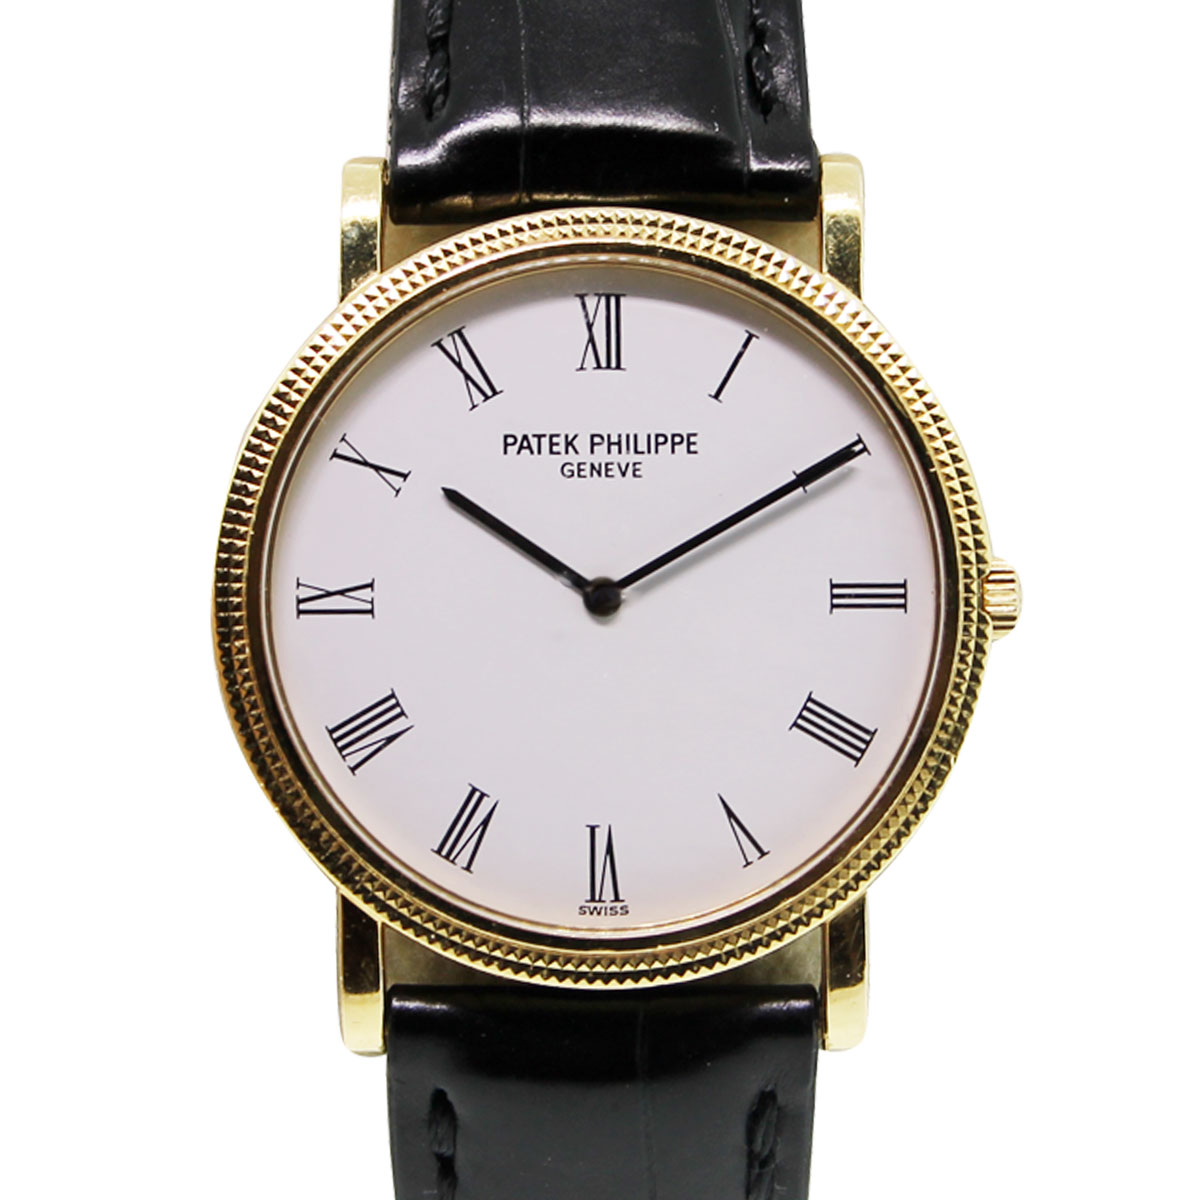 Patek Philippe 3520DJ001 Calatrava White Roman Dial Watch